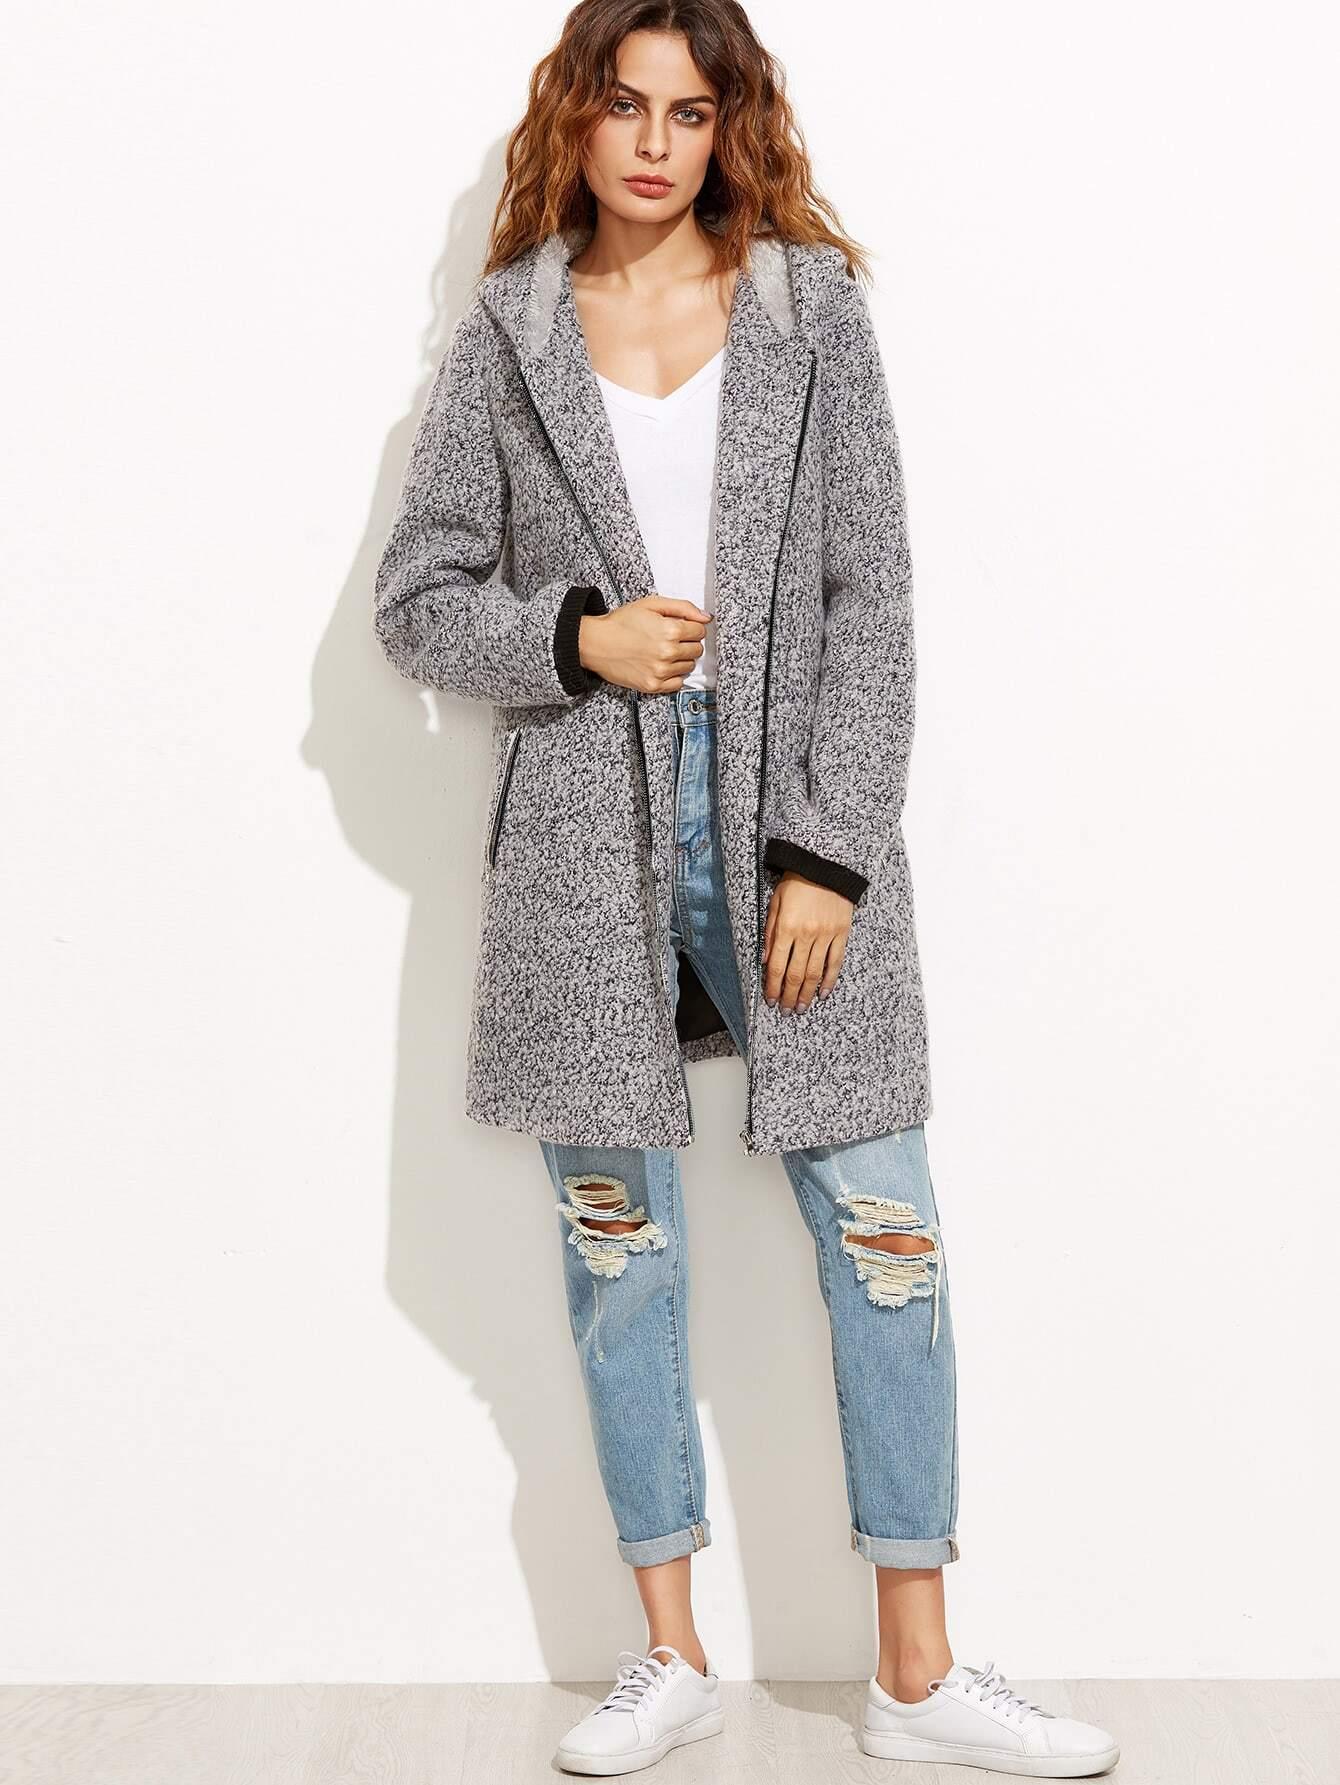 Wool Coat Outerwear Cheap Sale For Women-Us SheIn(Sheinside)